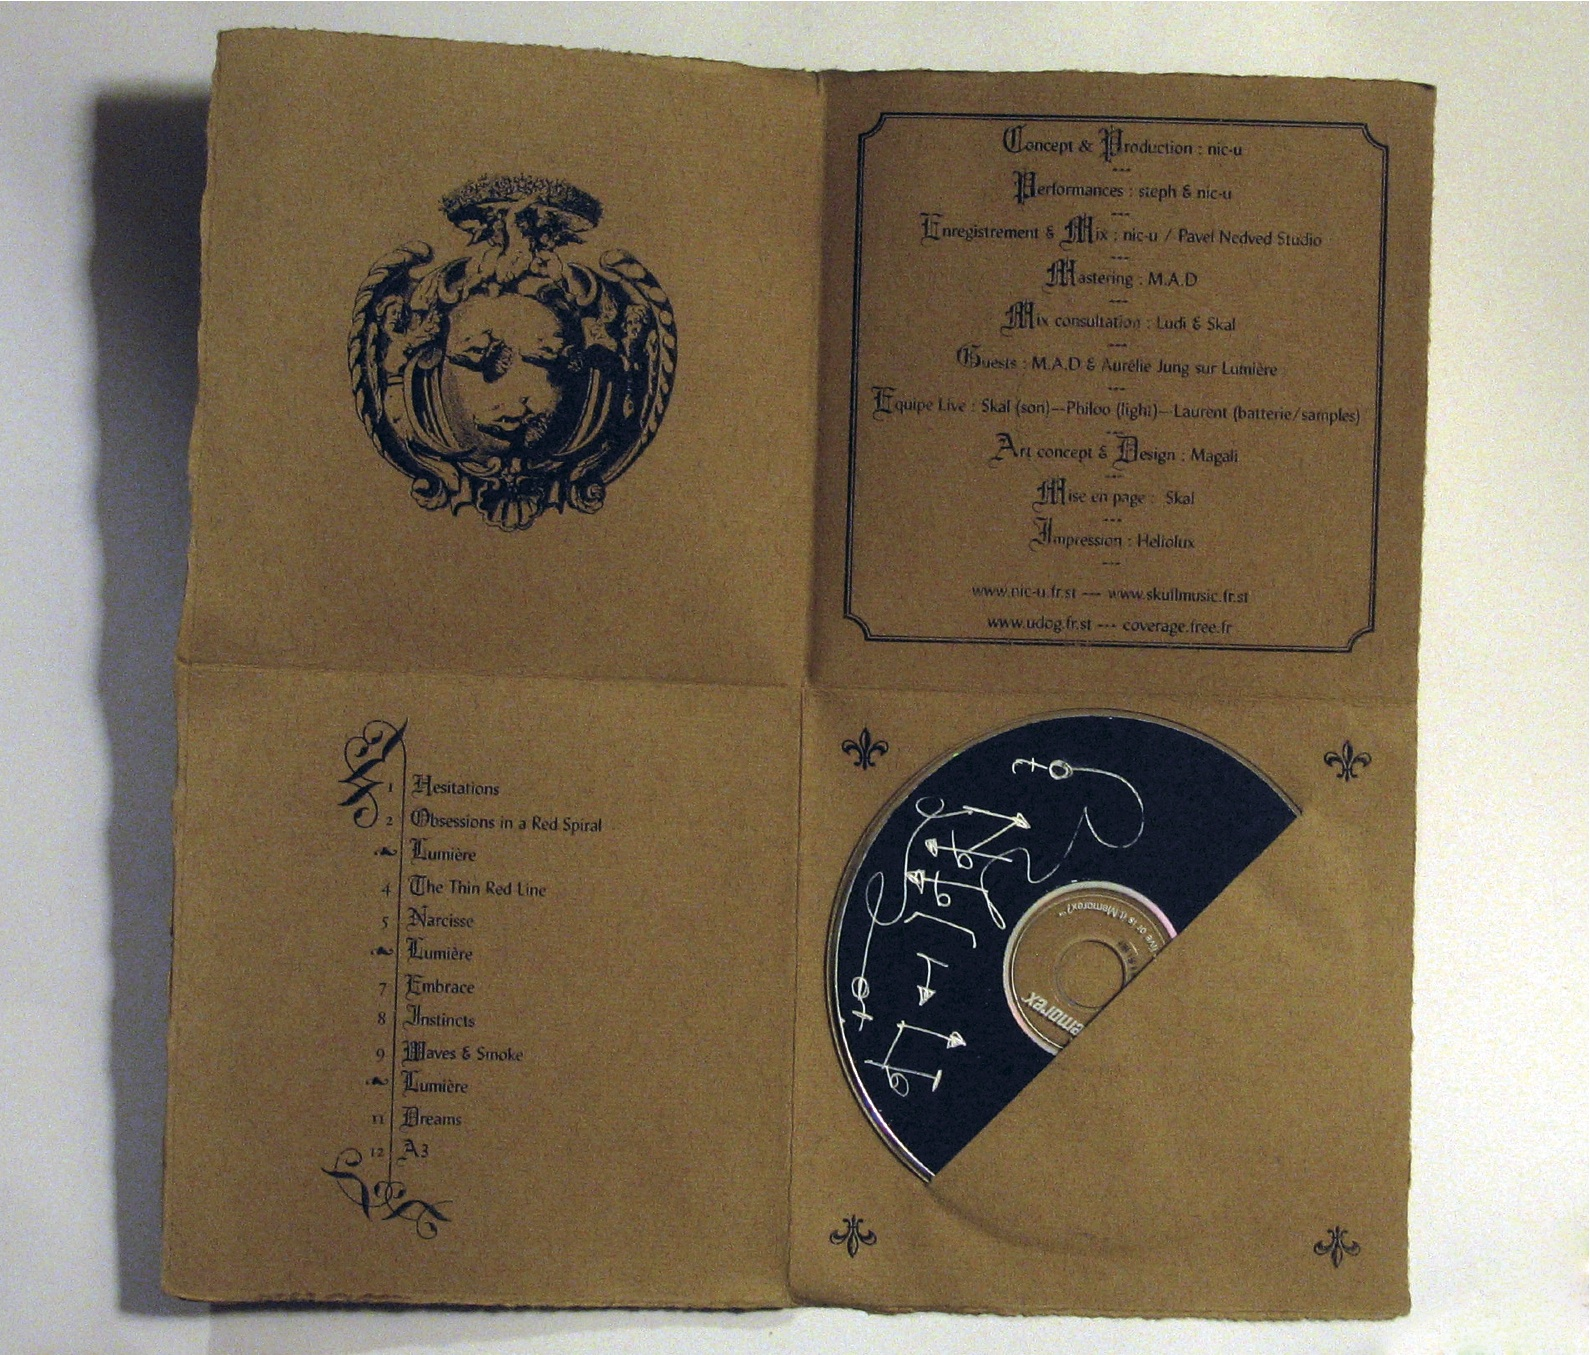 Pochette CD Nic-U, musicien